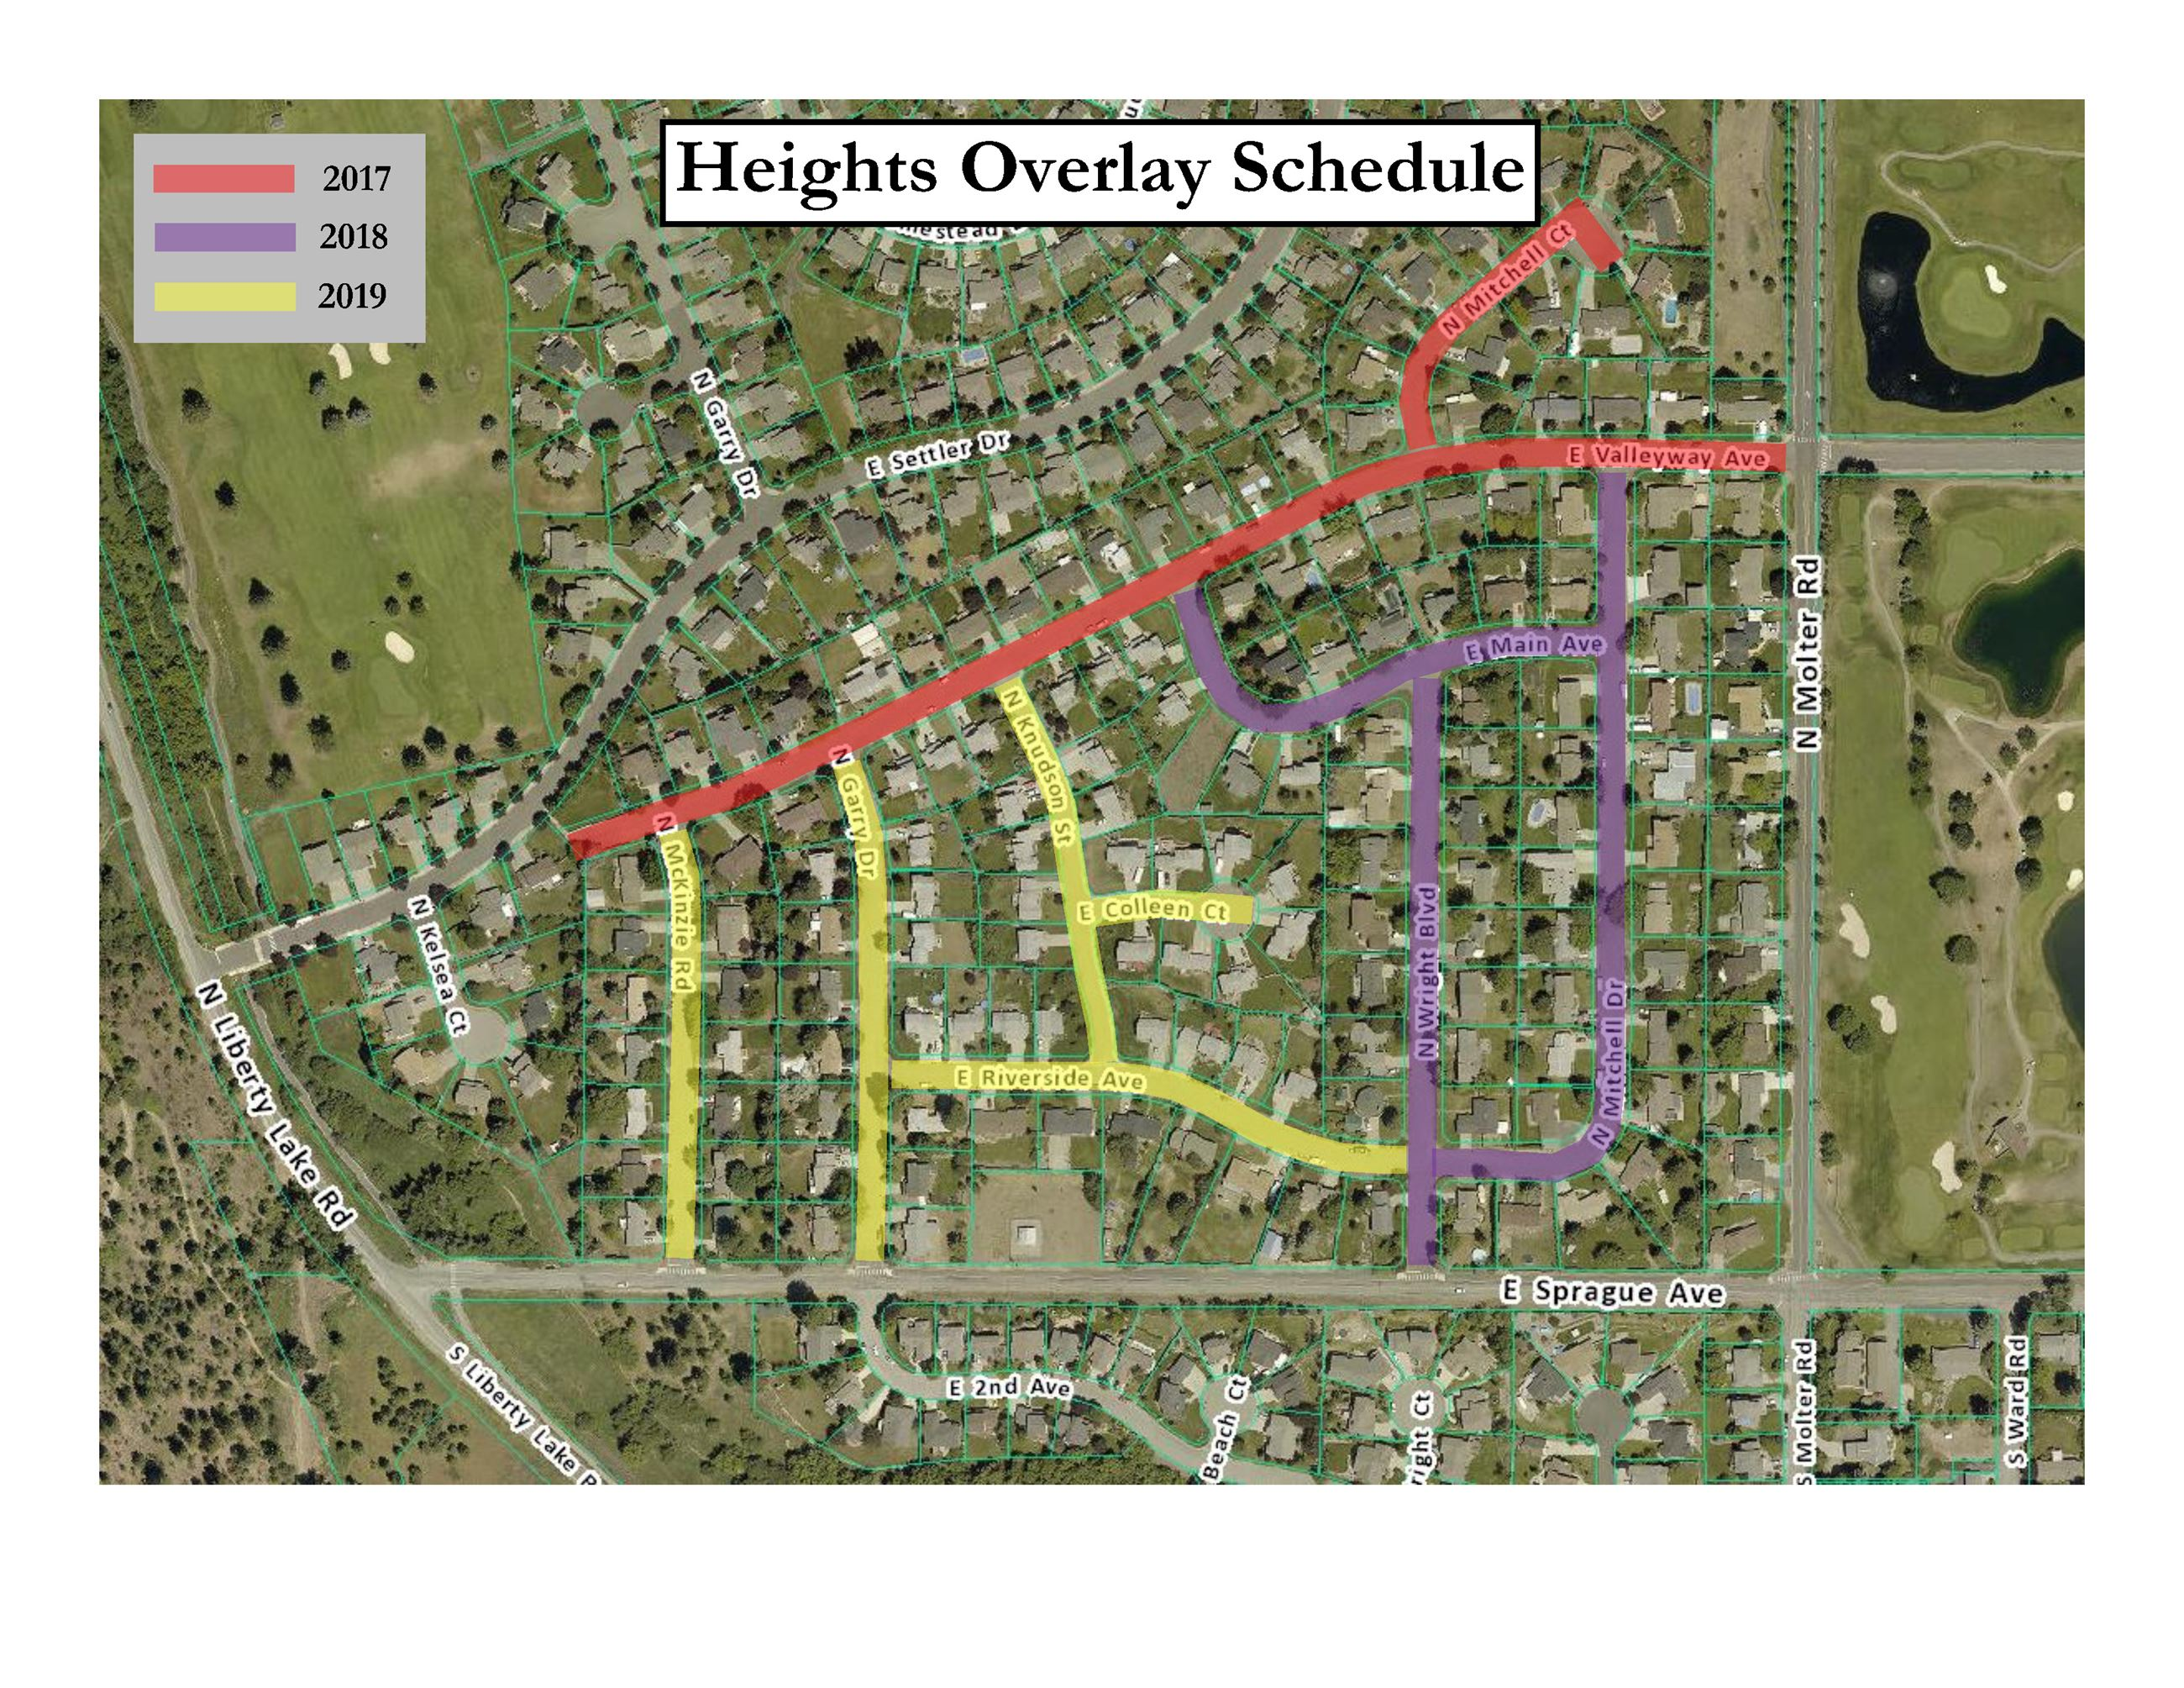 Home depot liberty lake wa - Heights Overlay Phase 1